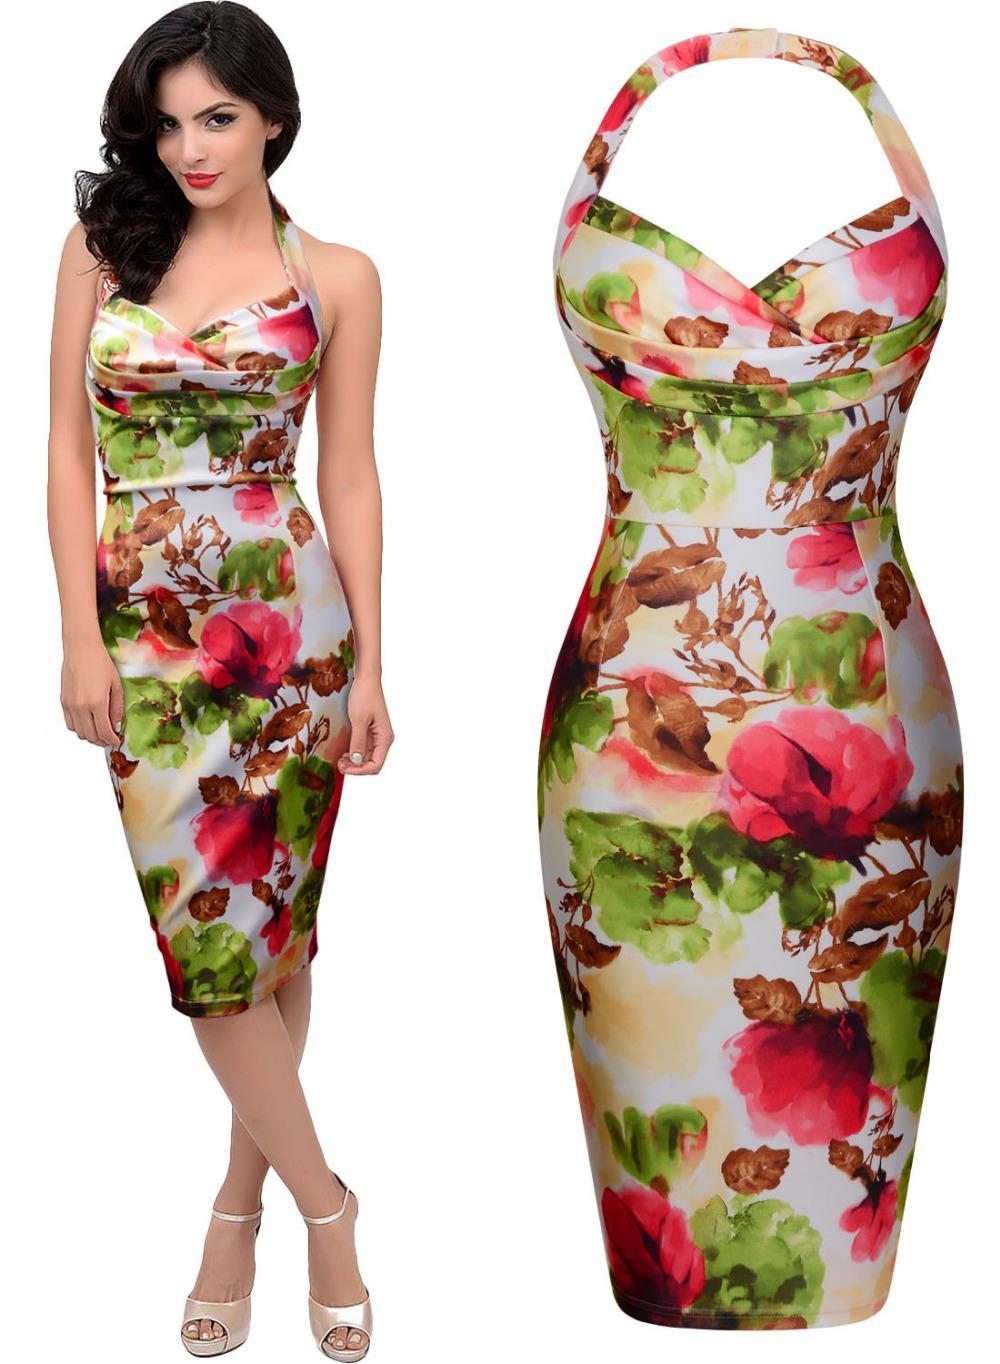 Cheap Hawaiian Dresses For Women - Cocktail Dresses 2016